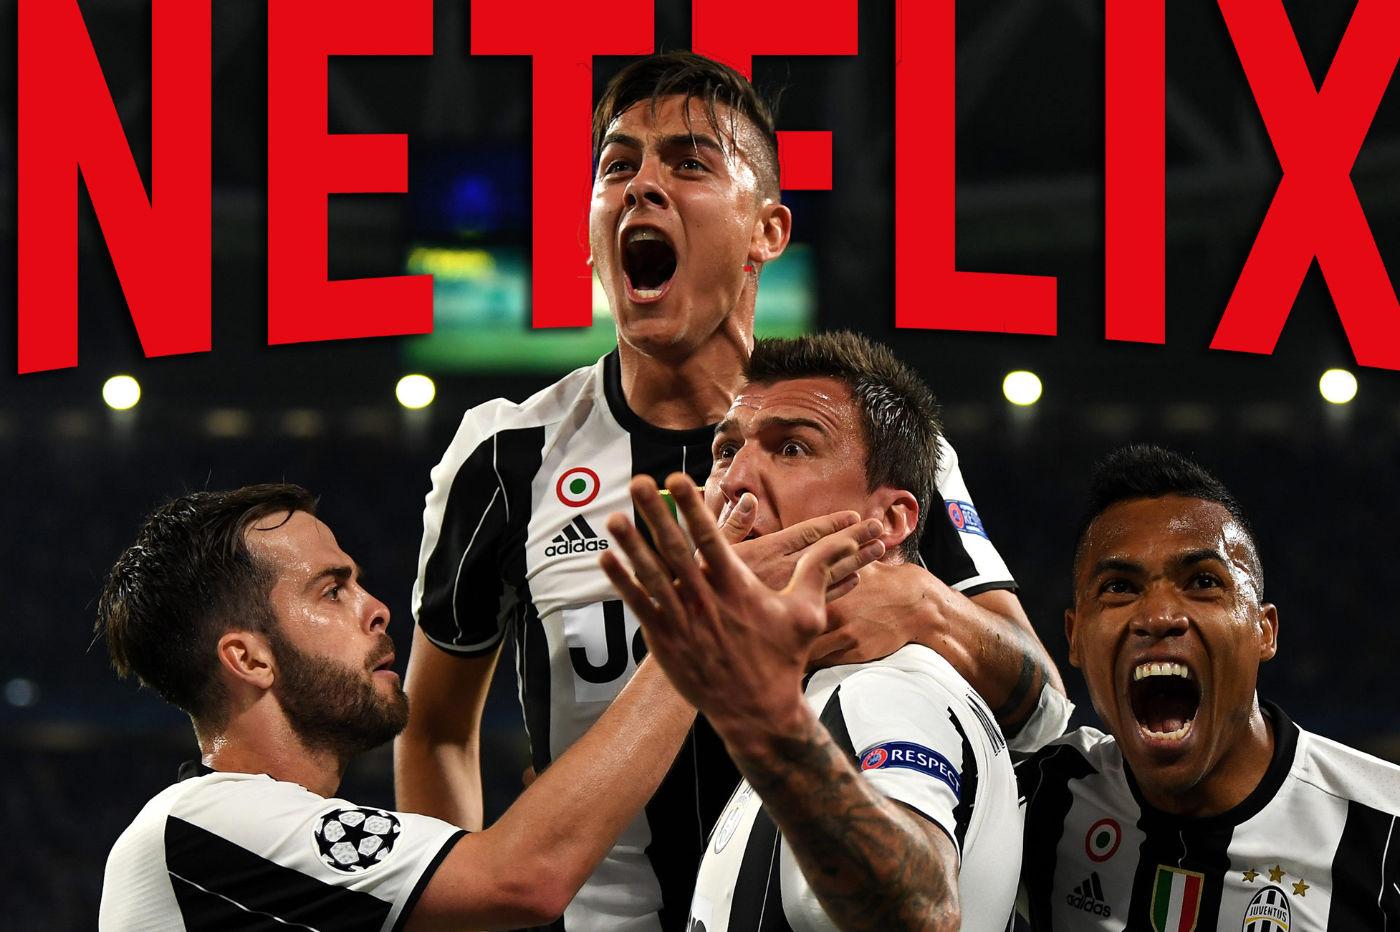 Netflix trouve un accord avec Mediapro